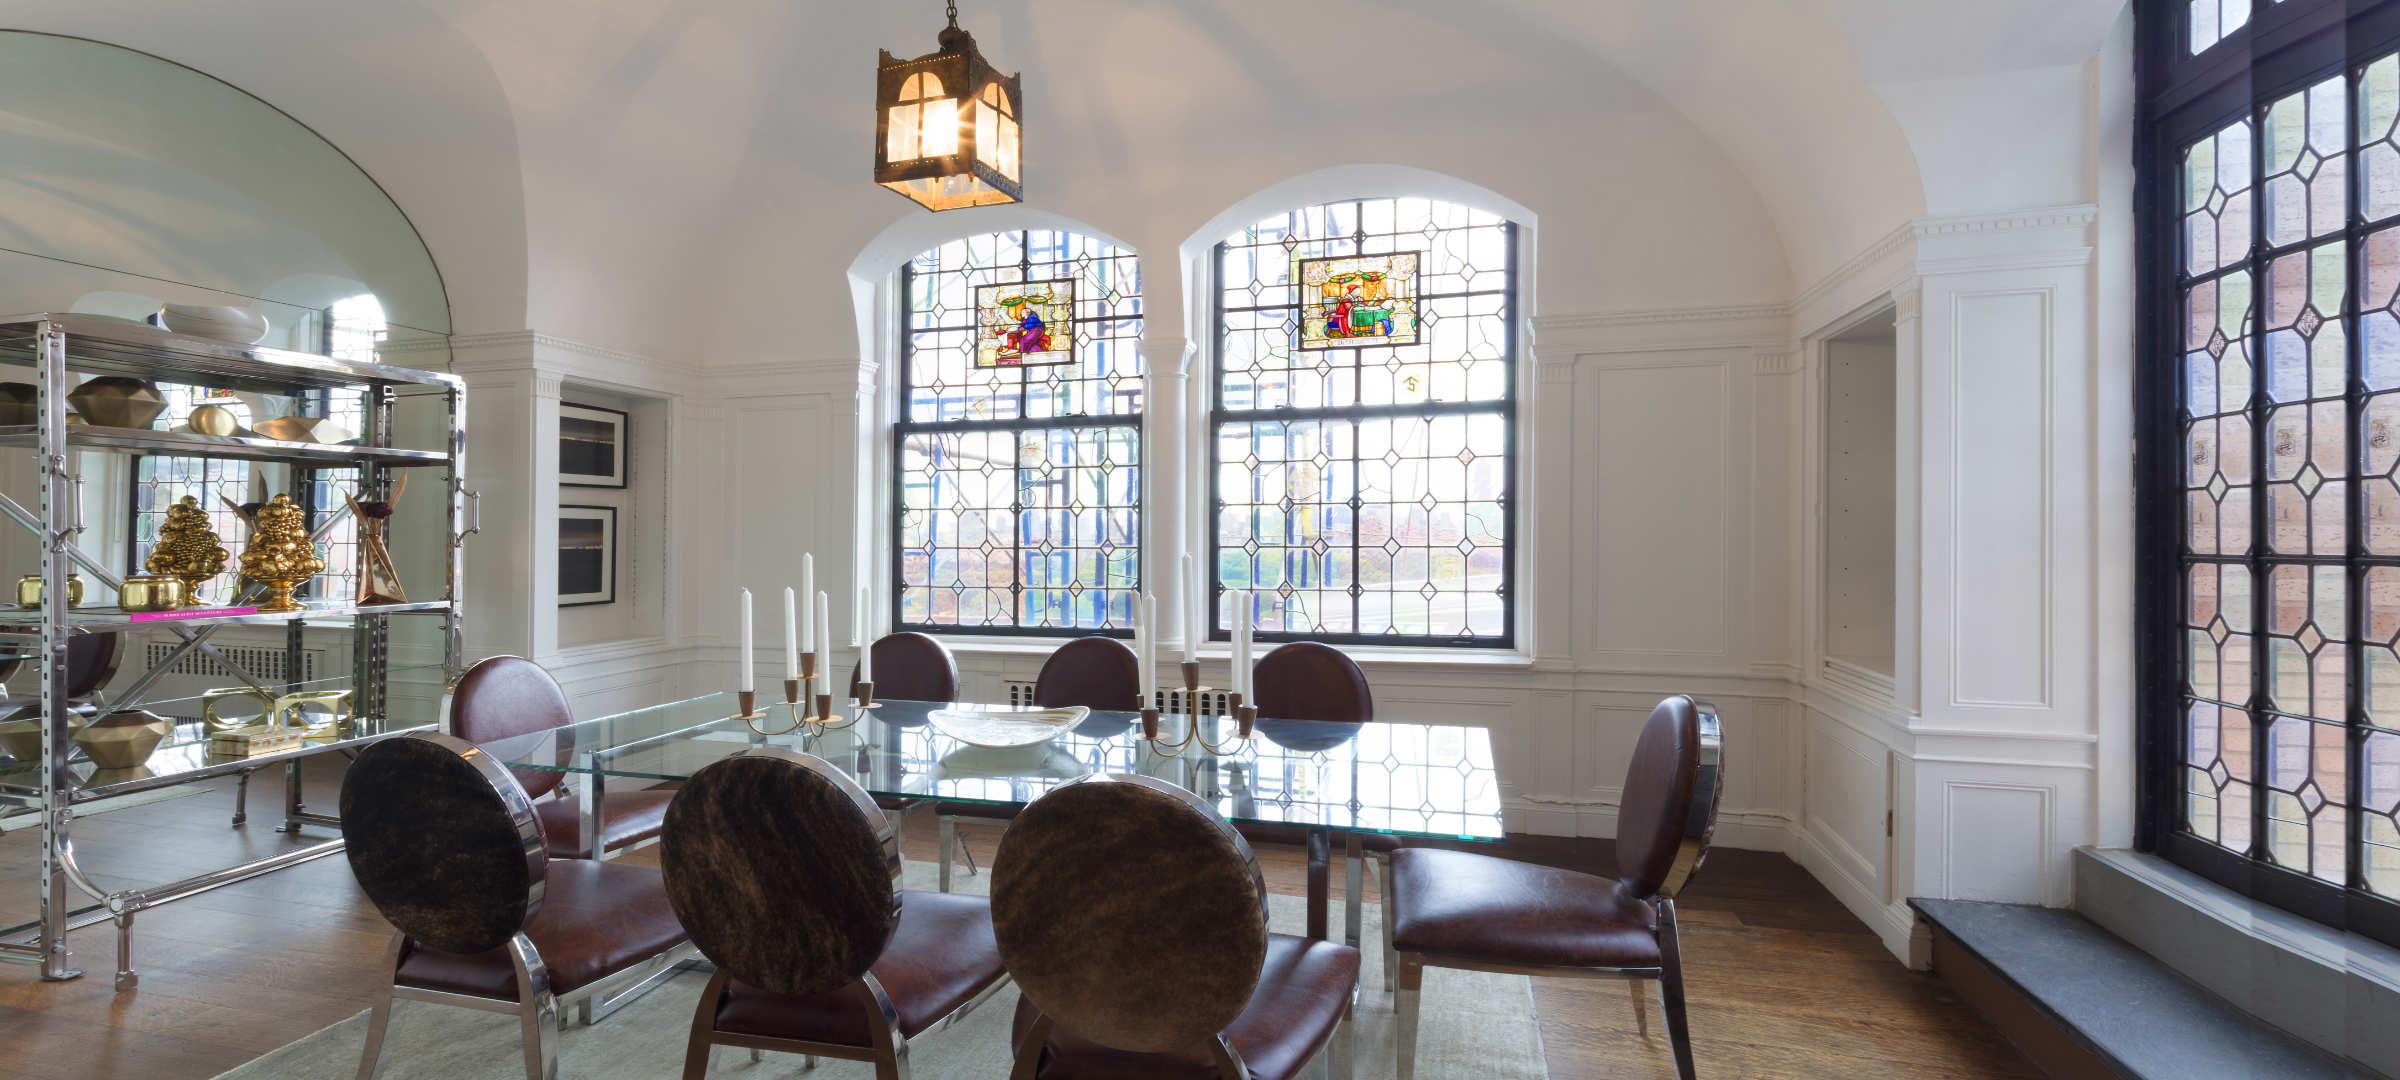 SBSG Interior Design Dining Room 91 Central Park West, NY